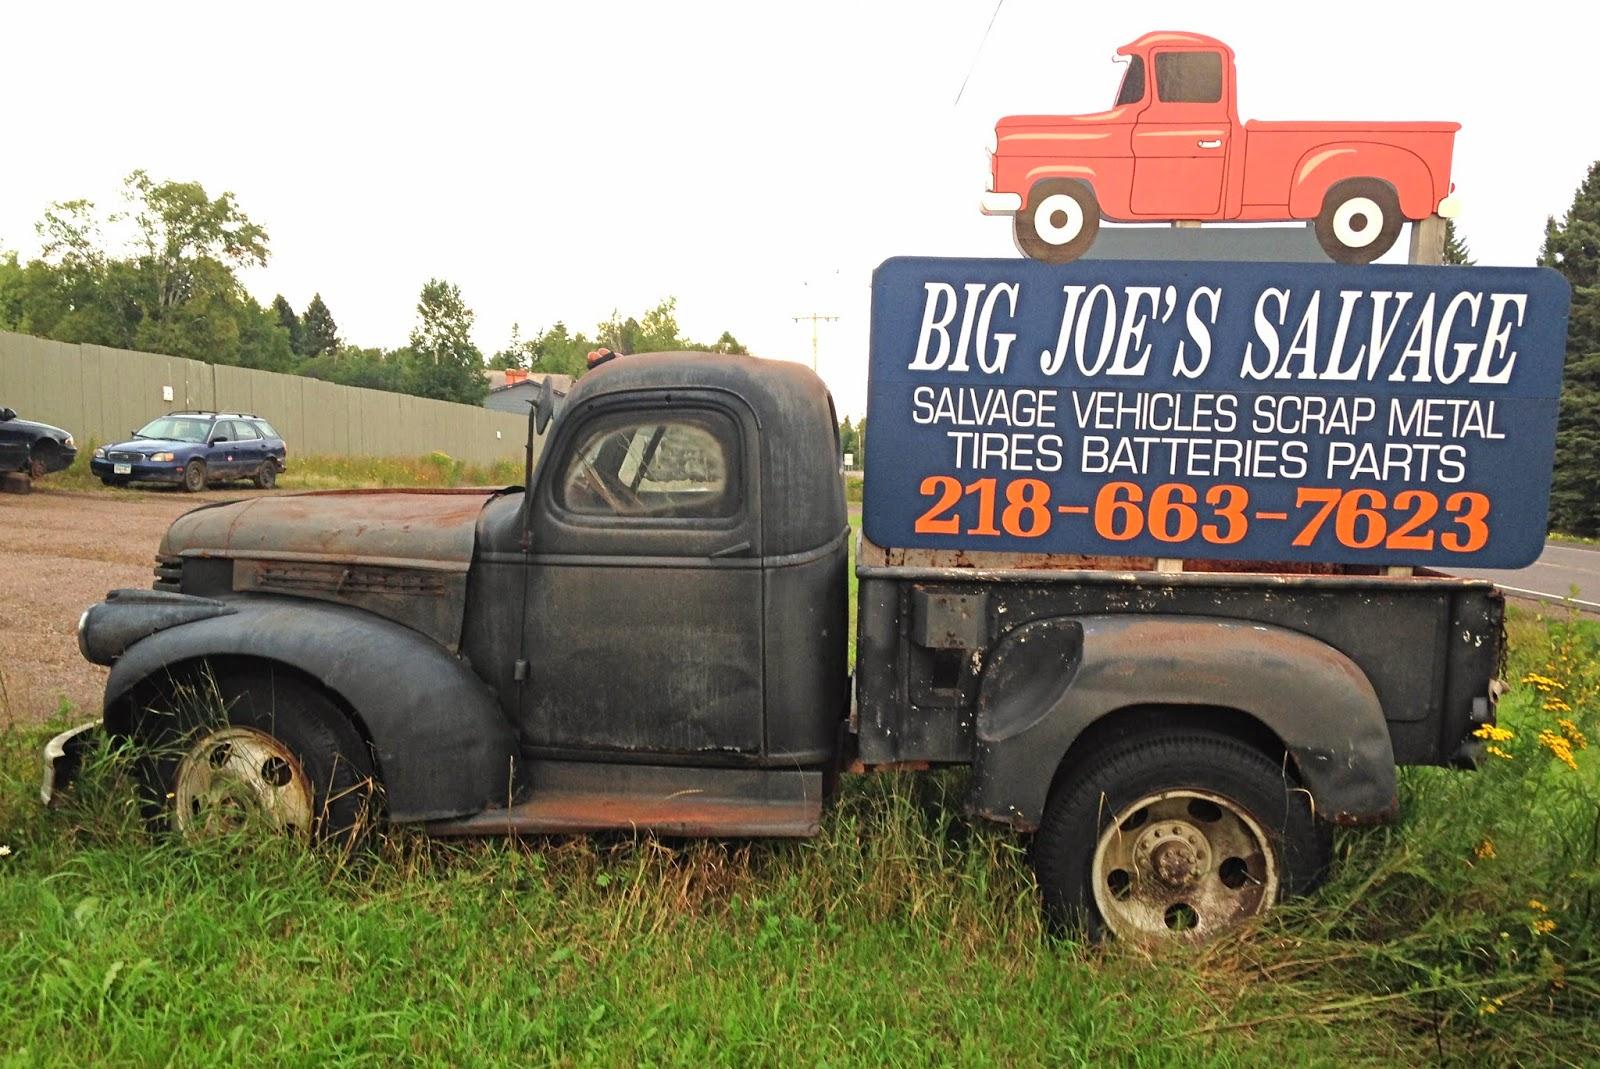 Autoliterate 1941 Chevrolet 3 4 Ton Big Joes Salvagetofte Minnesota Chevy Station Wagon